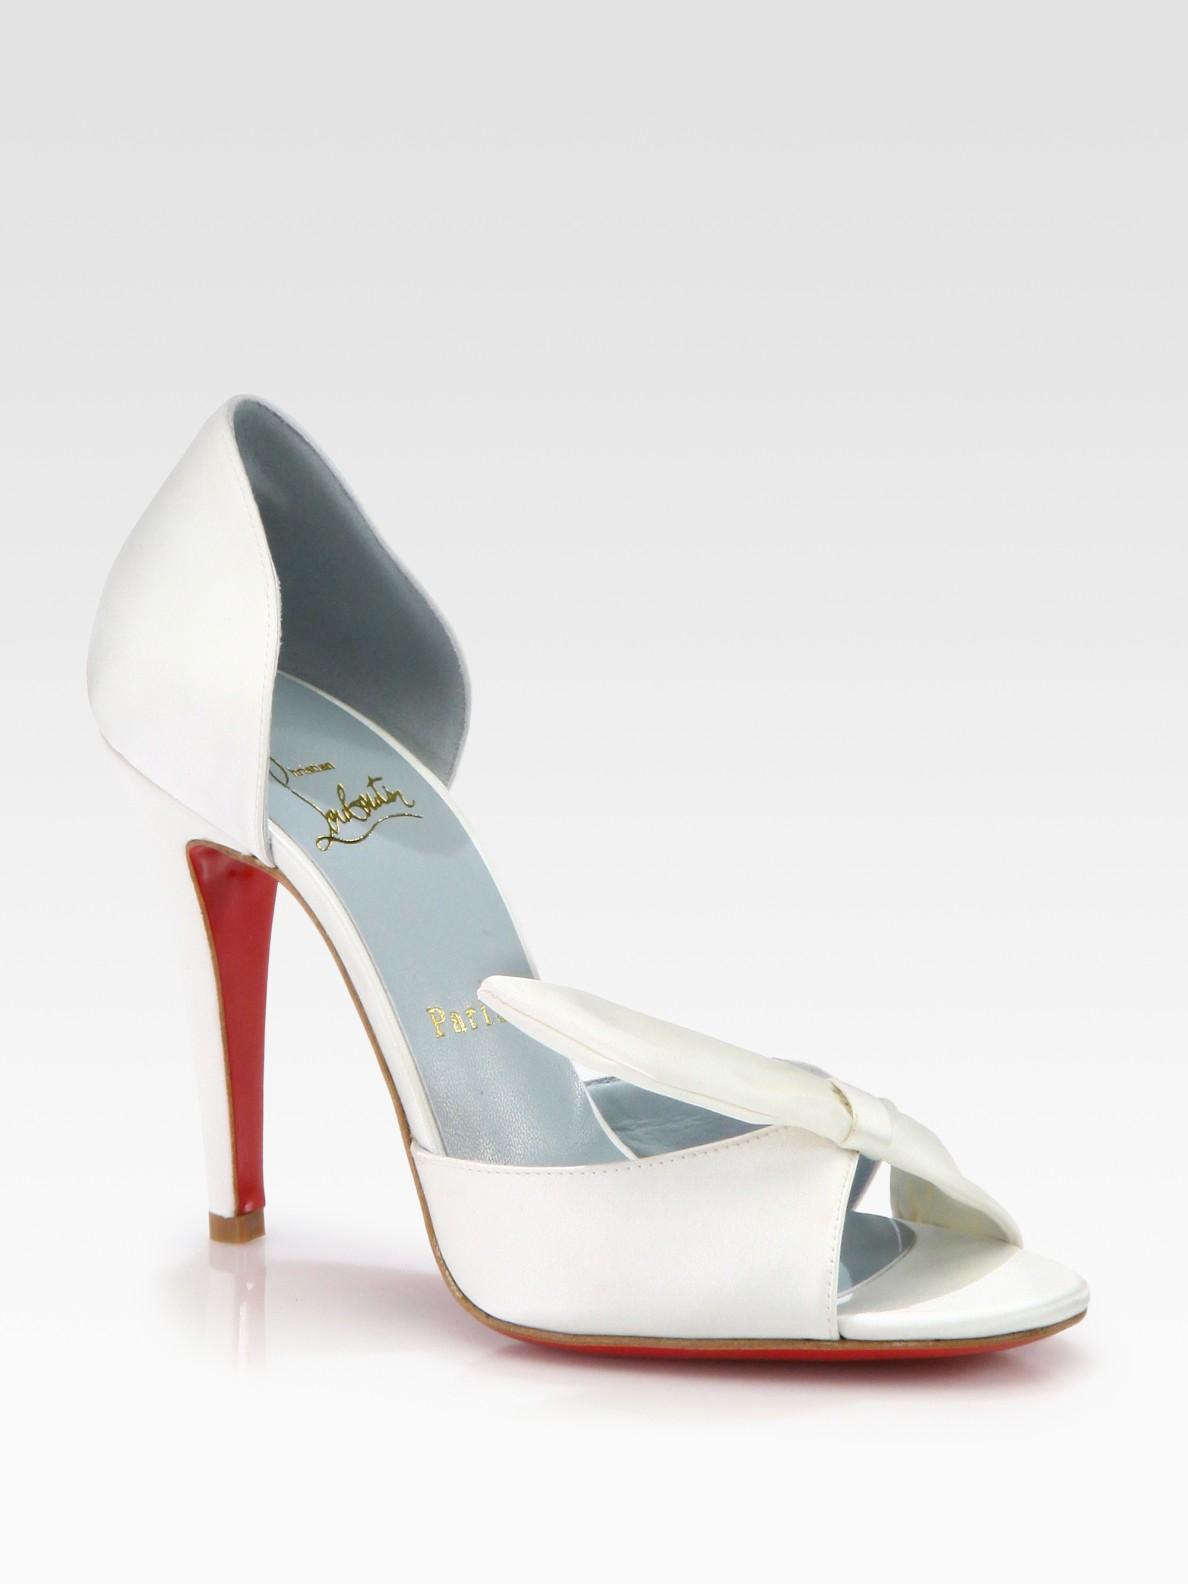 1a36a19186d3 ... discount lyst christian louboutin livrée satin bridal pump in white  d993f 3ef71